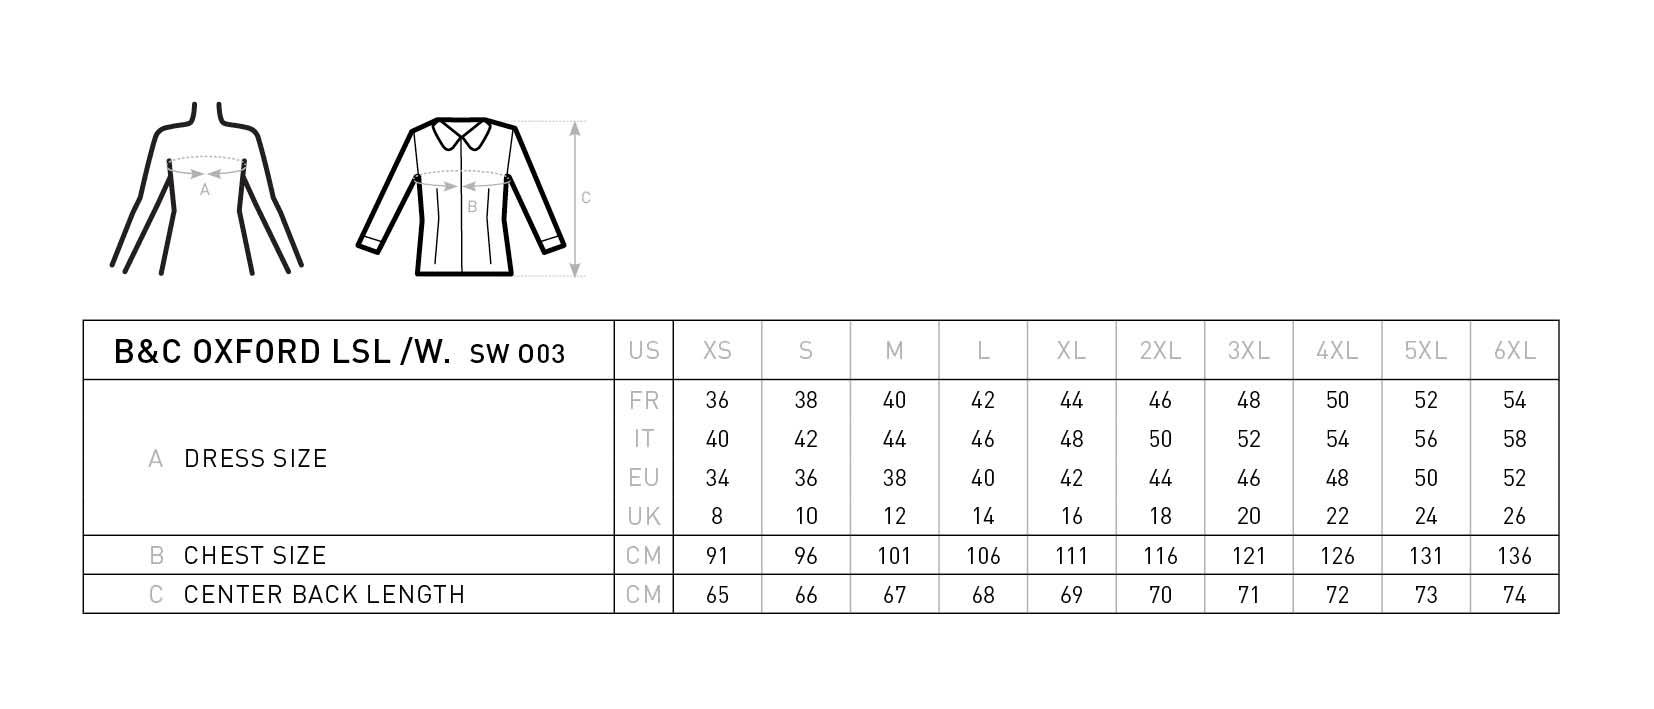 Grössentabelle GrössentabelleOxford Bluse langarm B&C | Oxford LSL /women